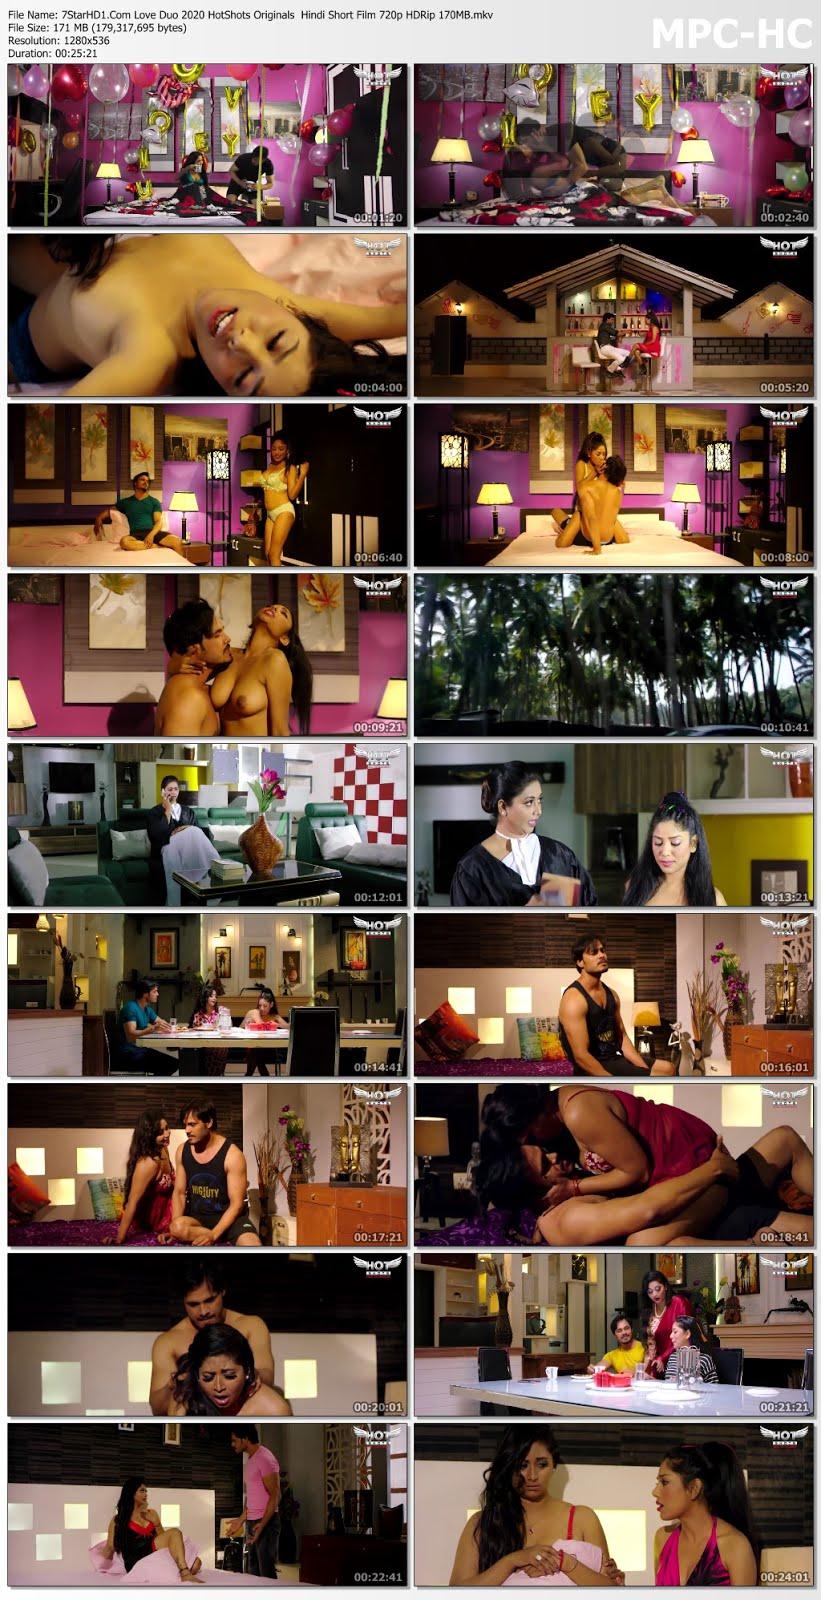 Love Duo 2020 HotShots Originals Hindi Short Film 720p HDRip ...